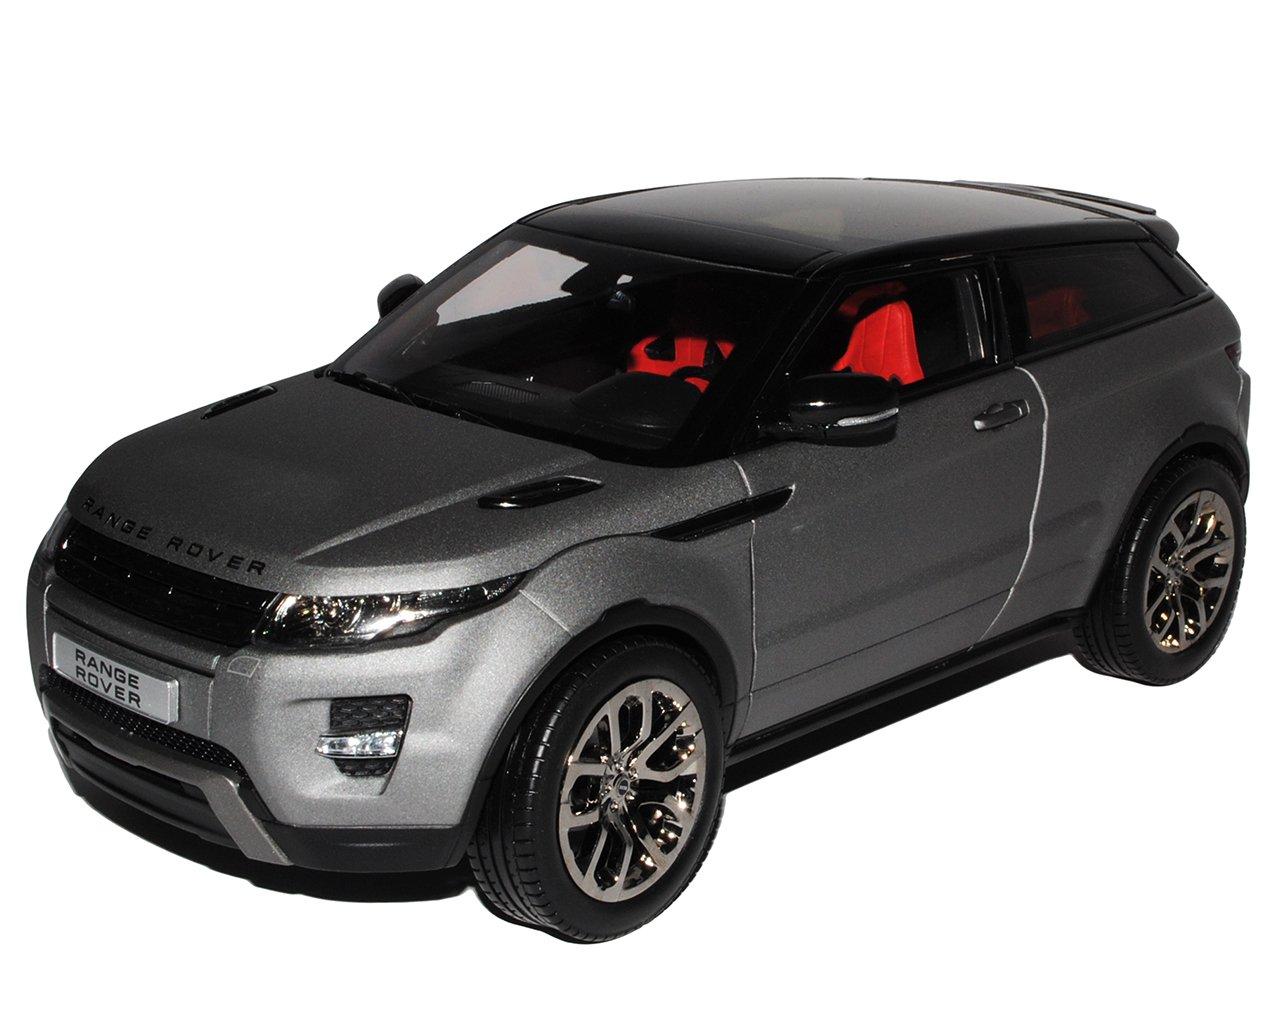 GTA Welly Land Rover Range Rover Evoque 3 Türer Matt Grau Ab 2011 1/18 Modell Auto